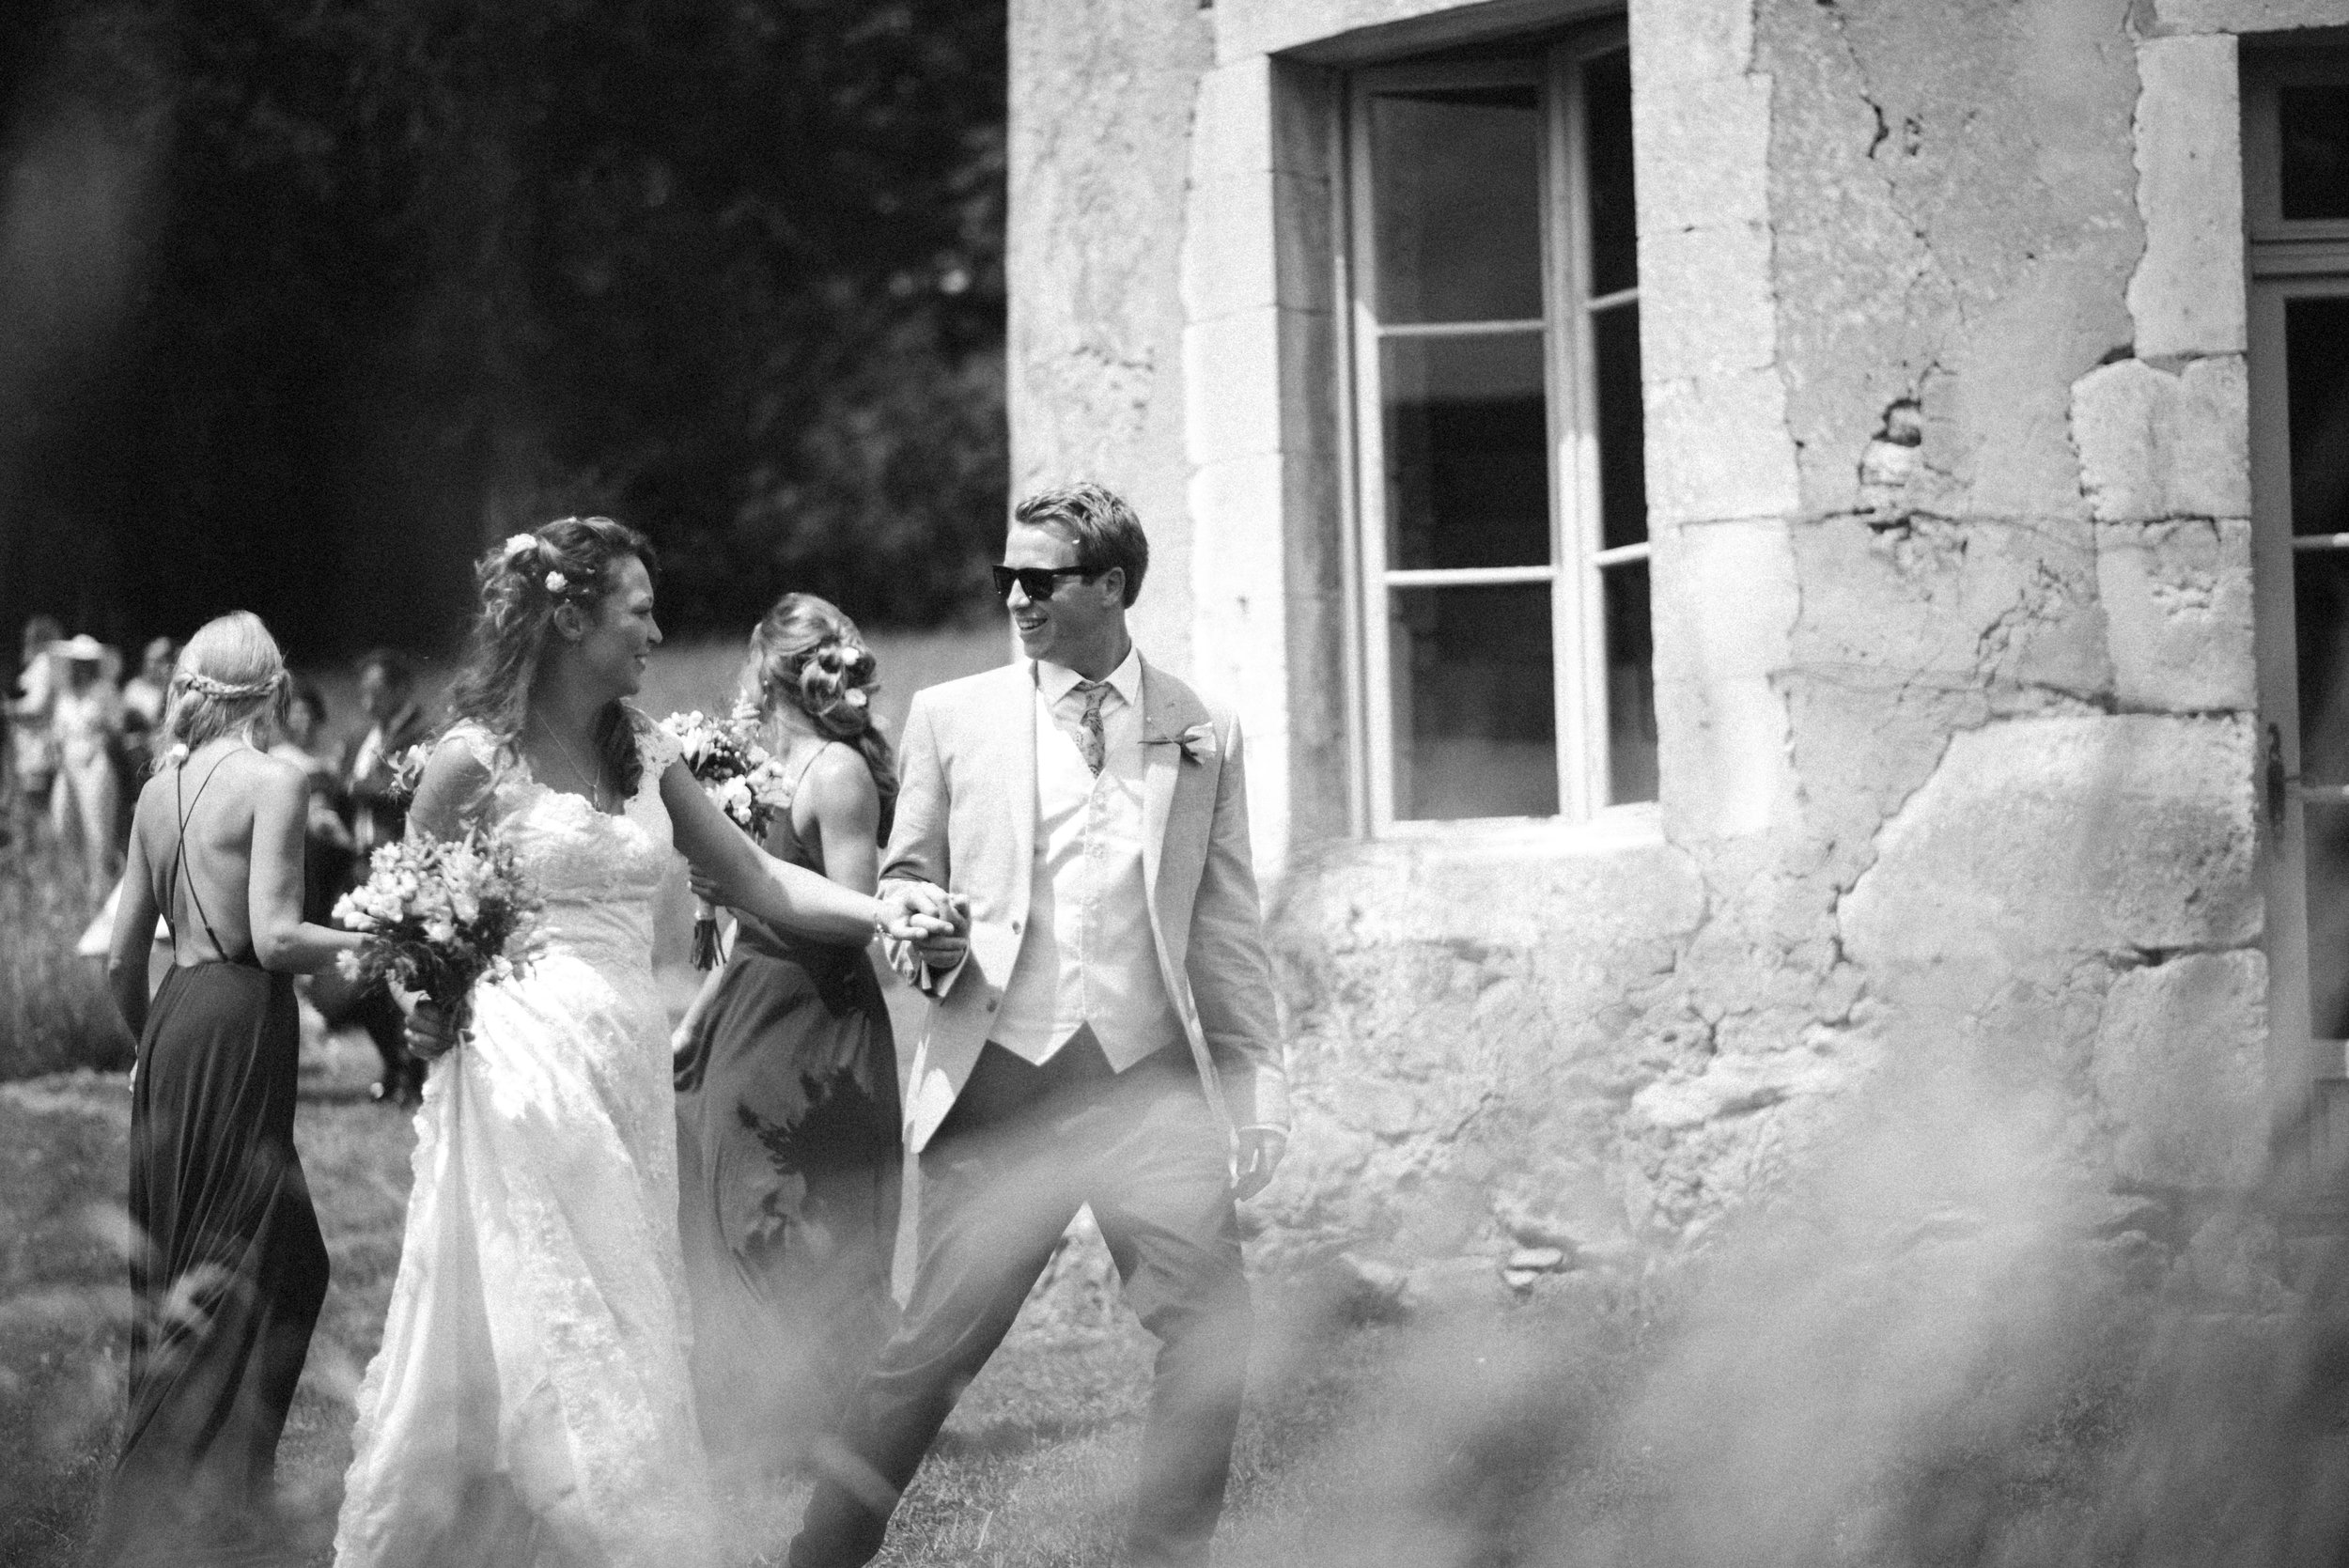 wedding-photographer-dordogne-mark-shaw-9.jpg